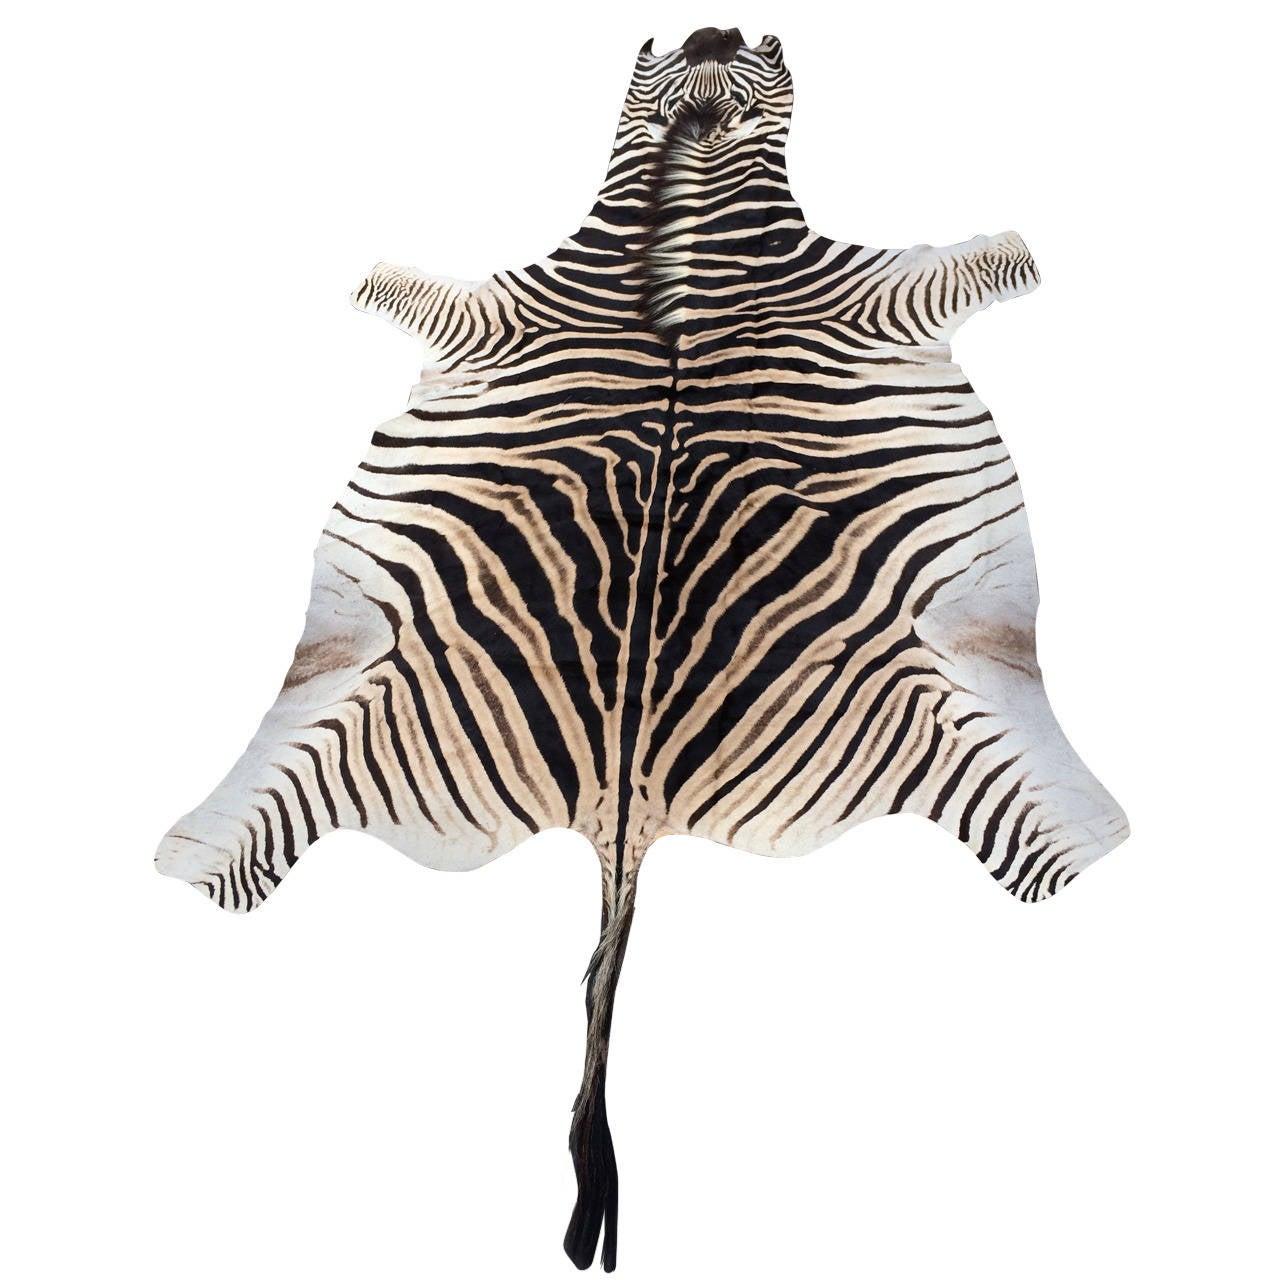 Zebra Rug Los Angeles: Zebra Hide At 1stdibs